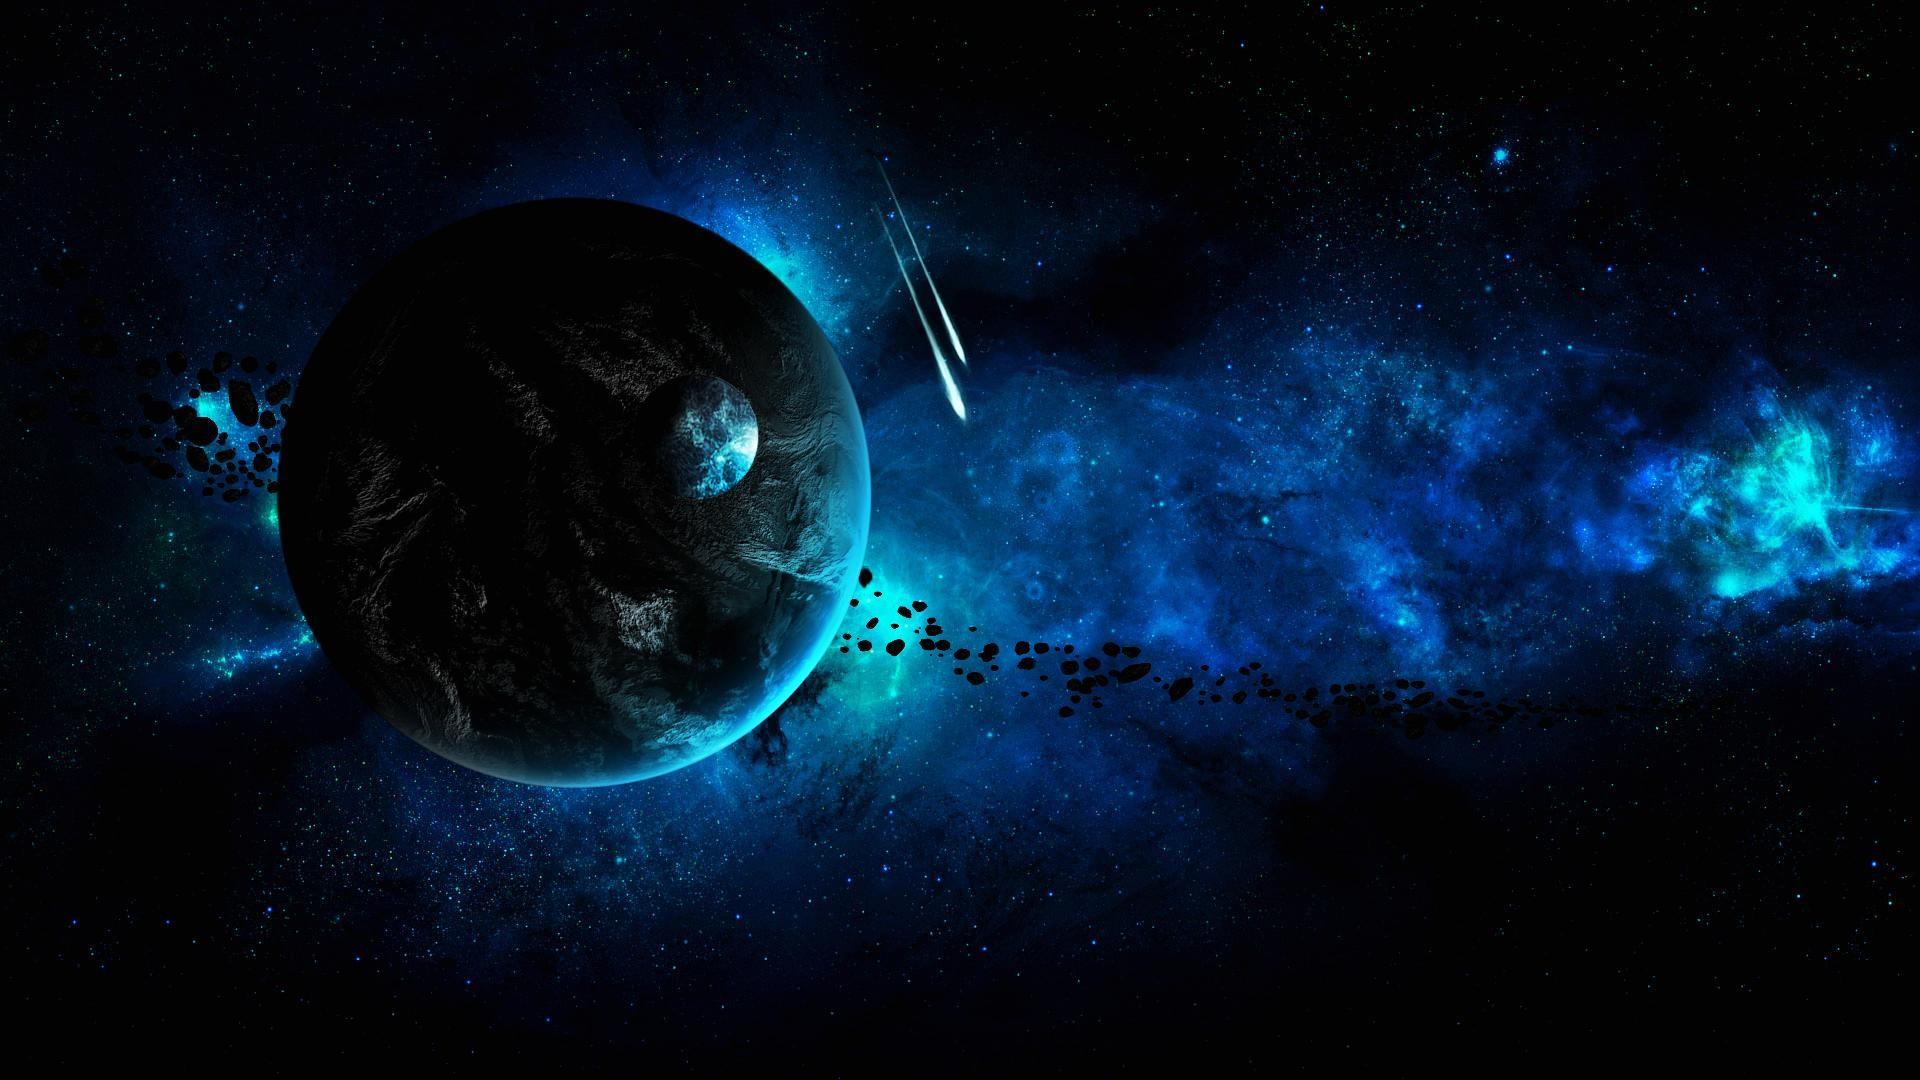 General 1920x1080 galaxy planet space art space digital art